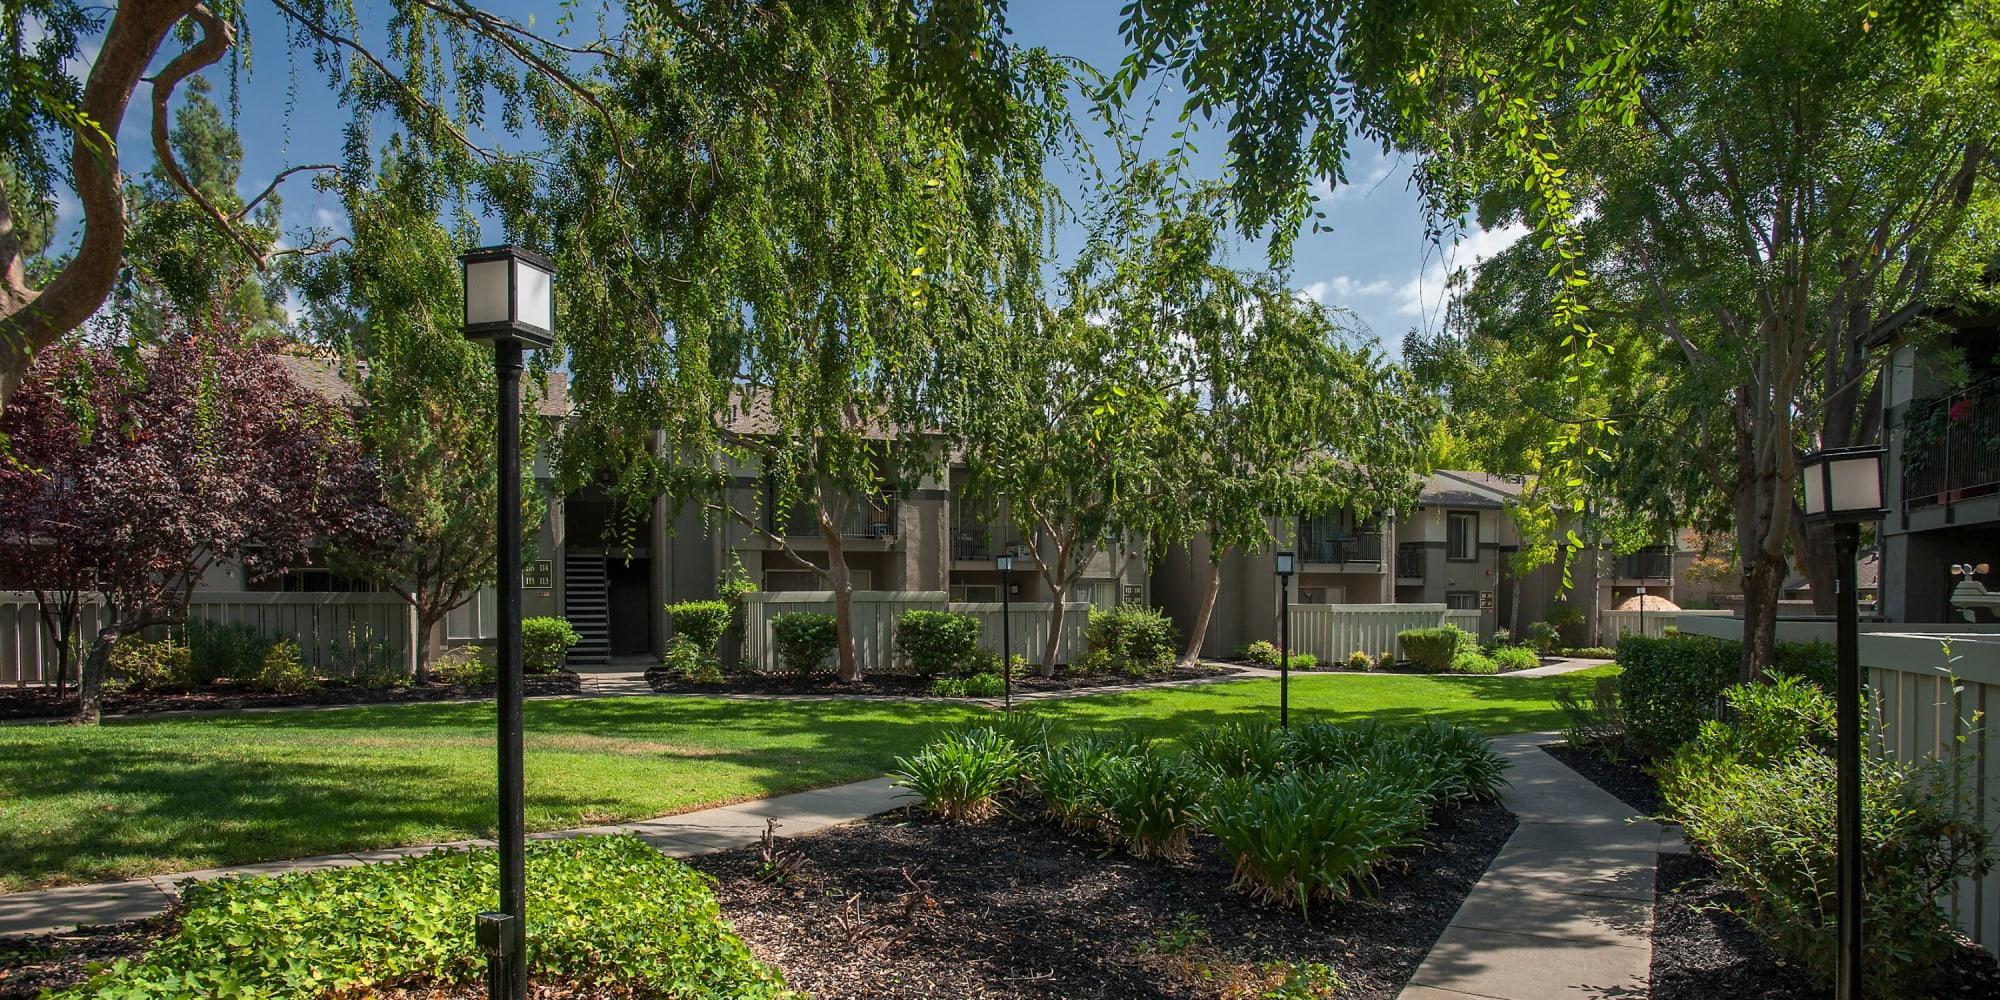 Luxury Valley Ridge Apartment Homes in Martinez, California